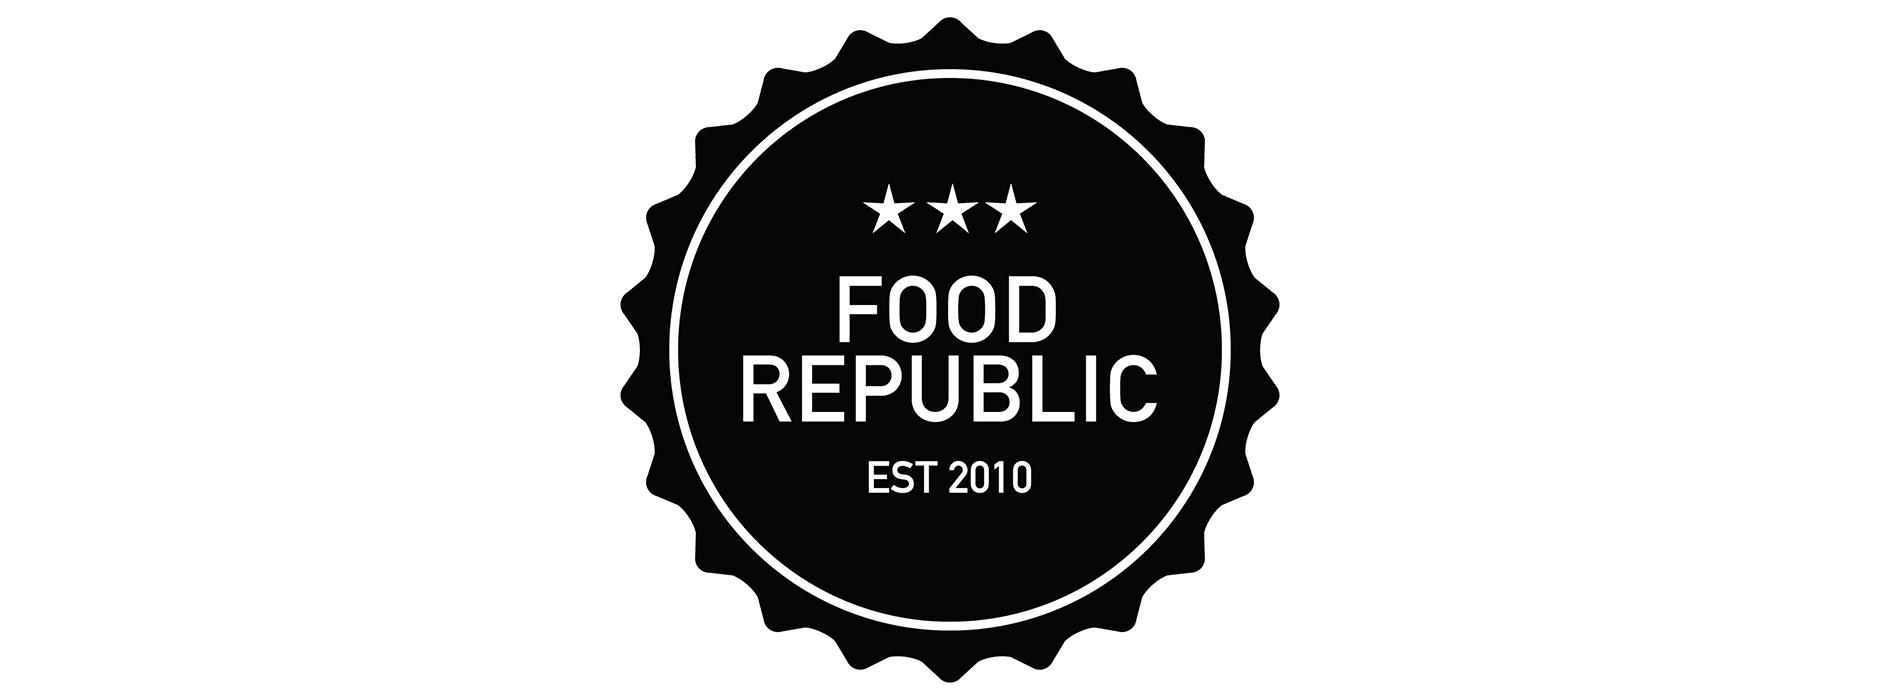 food republic.jpg